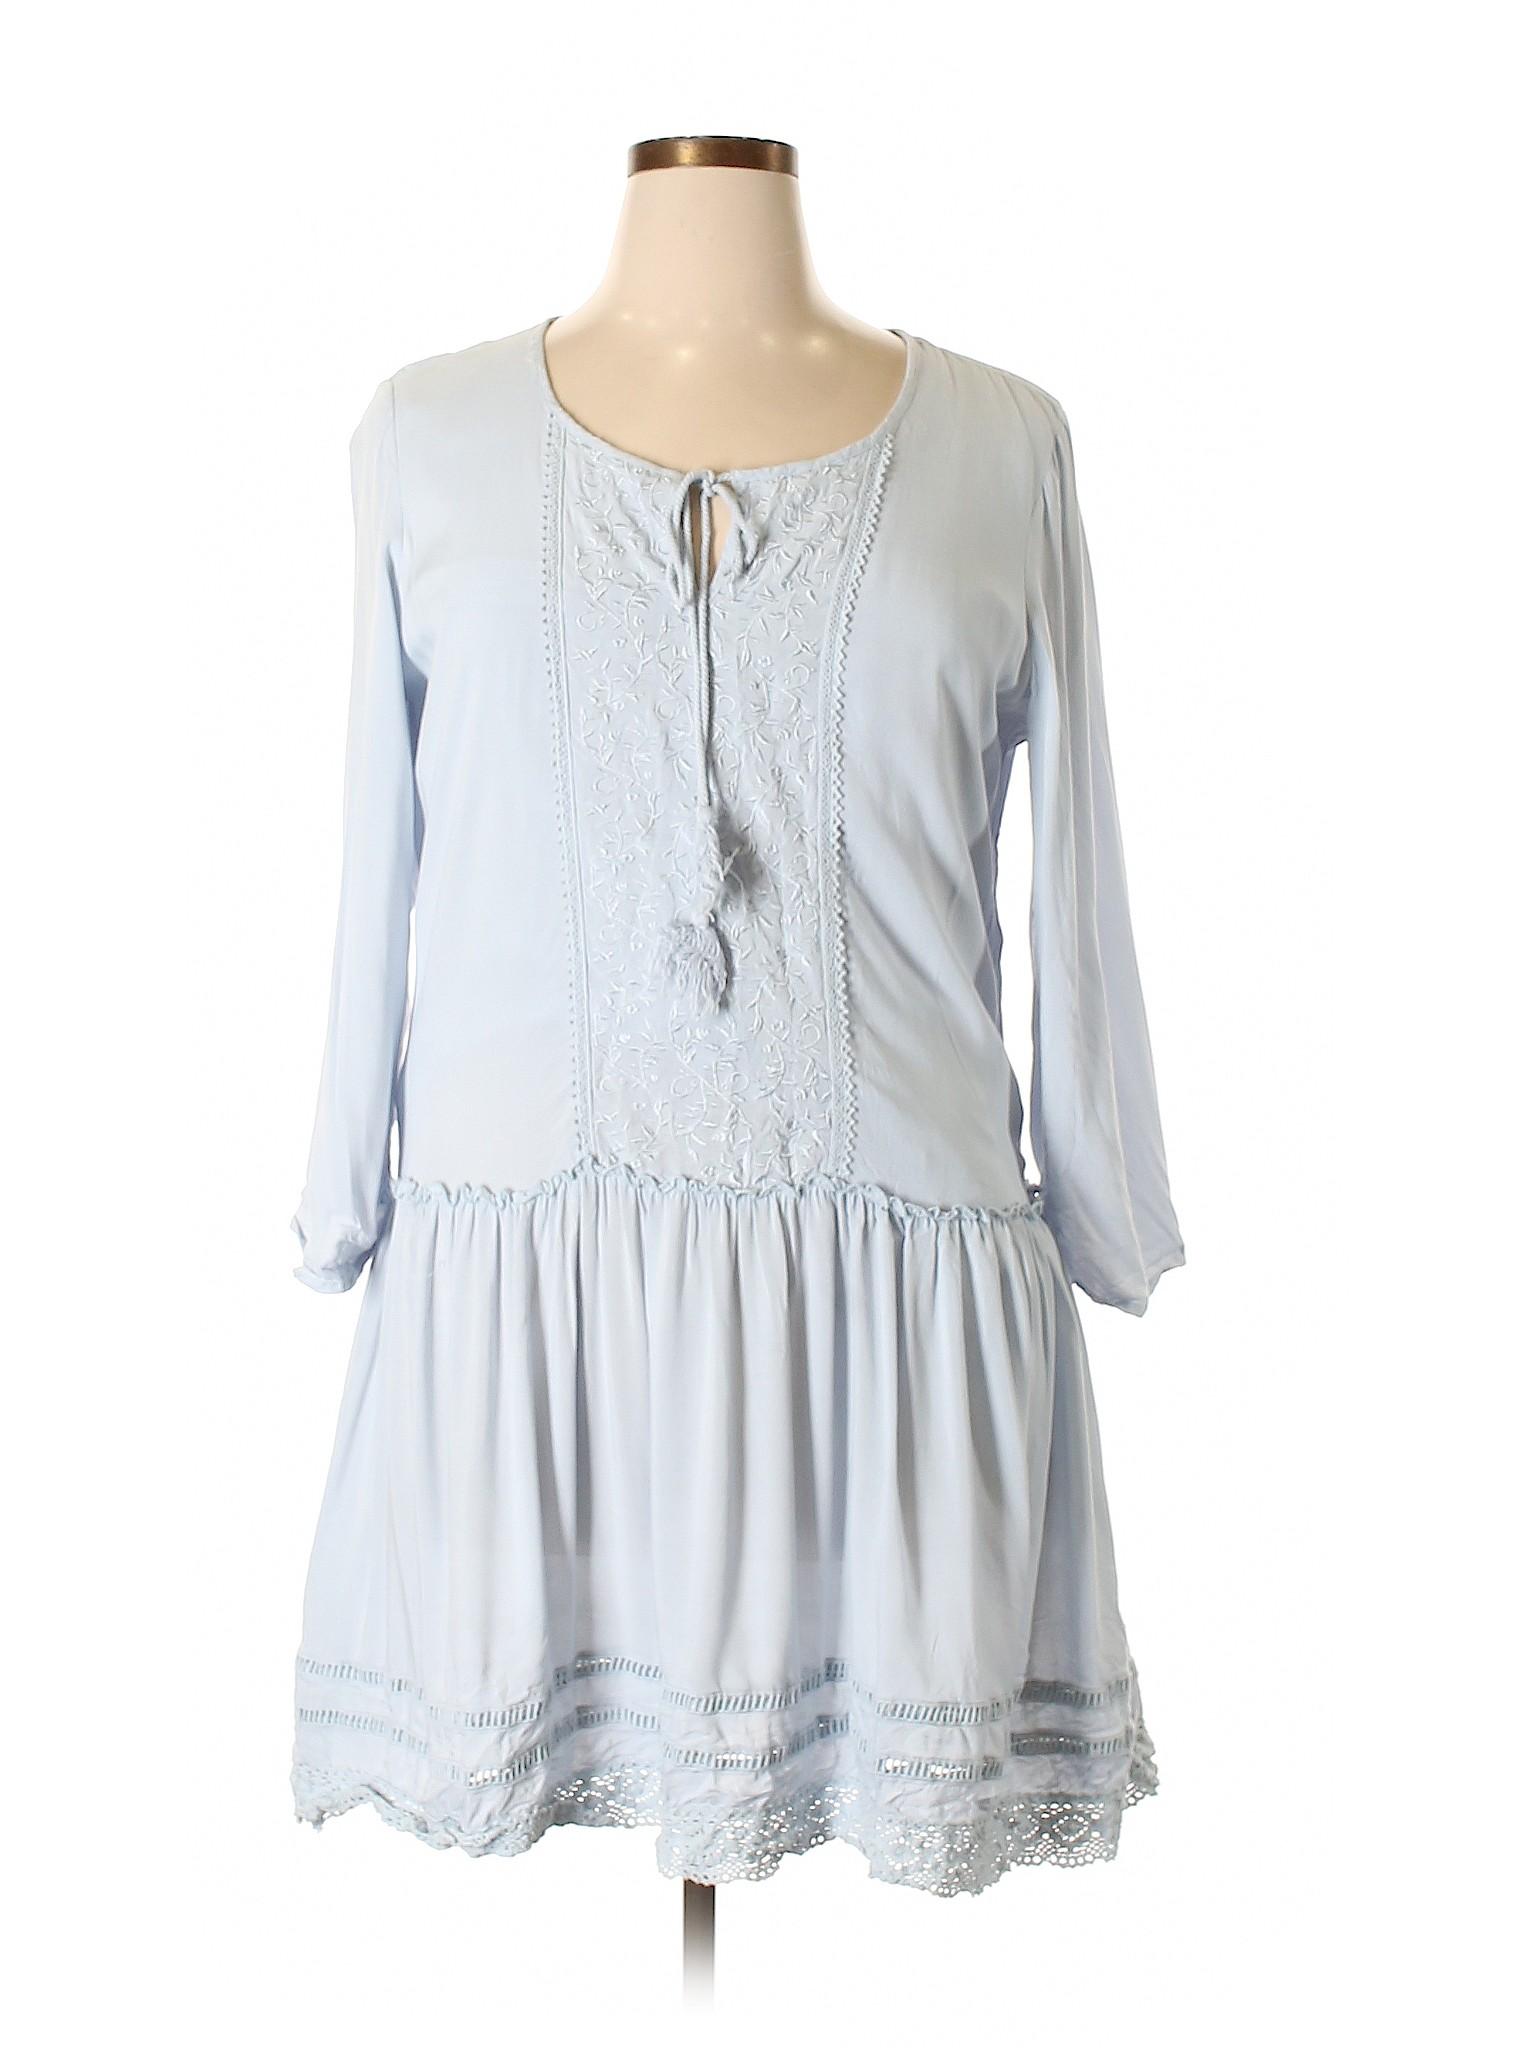 Boutique Dress Boutique winter winter Dress Casual Casual Cupio Cupio UqwI55Et